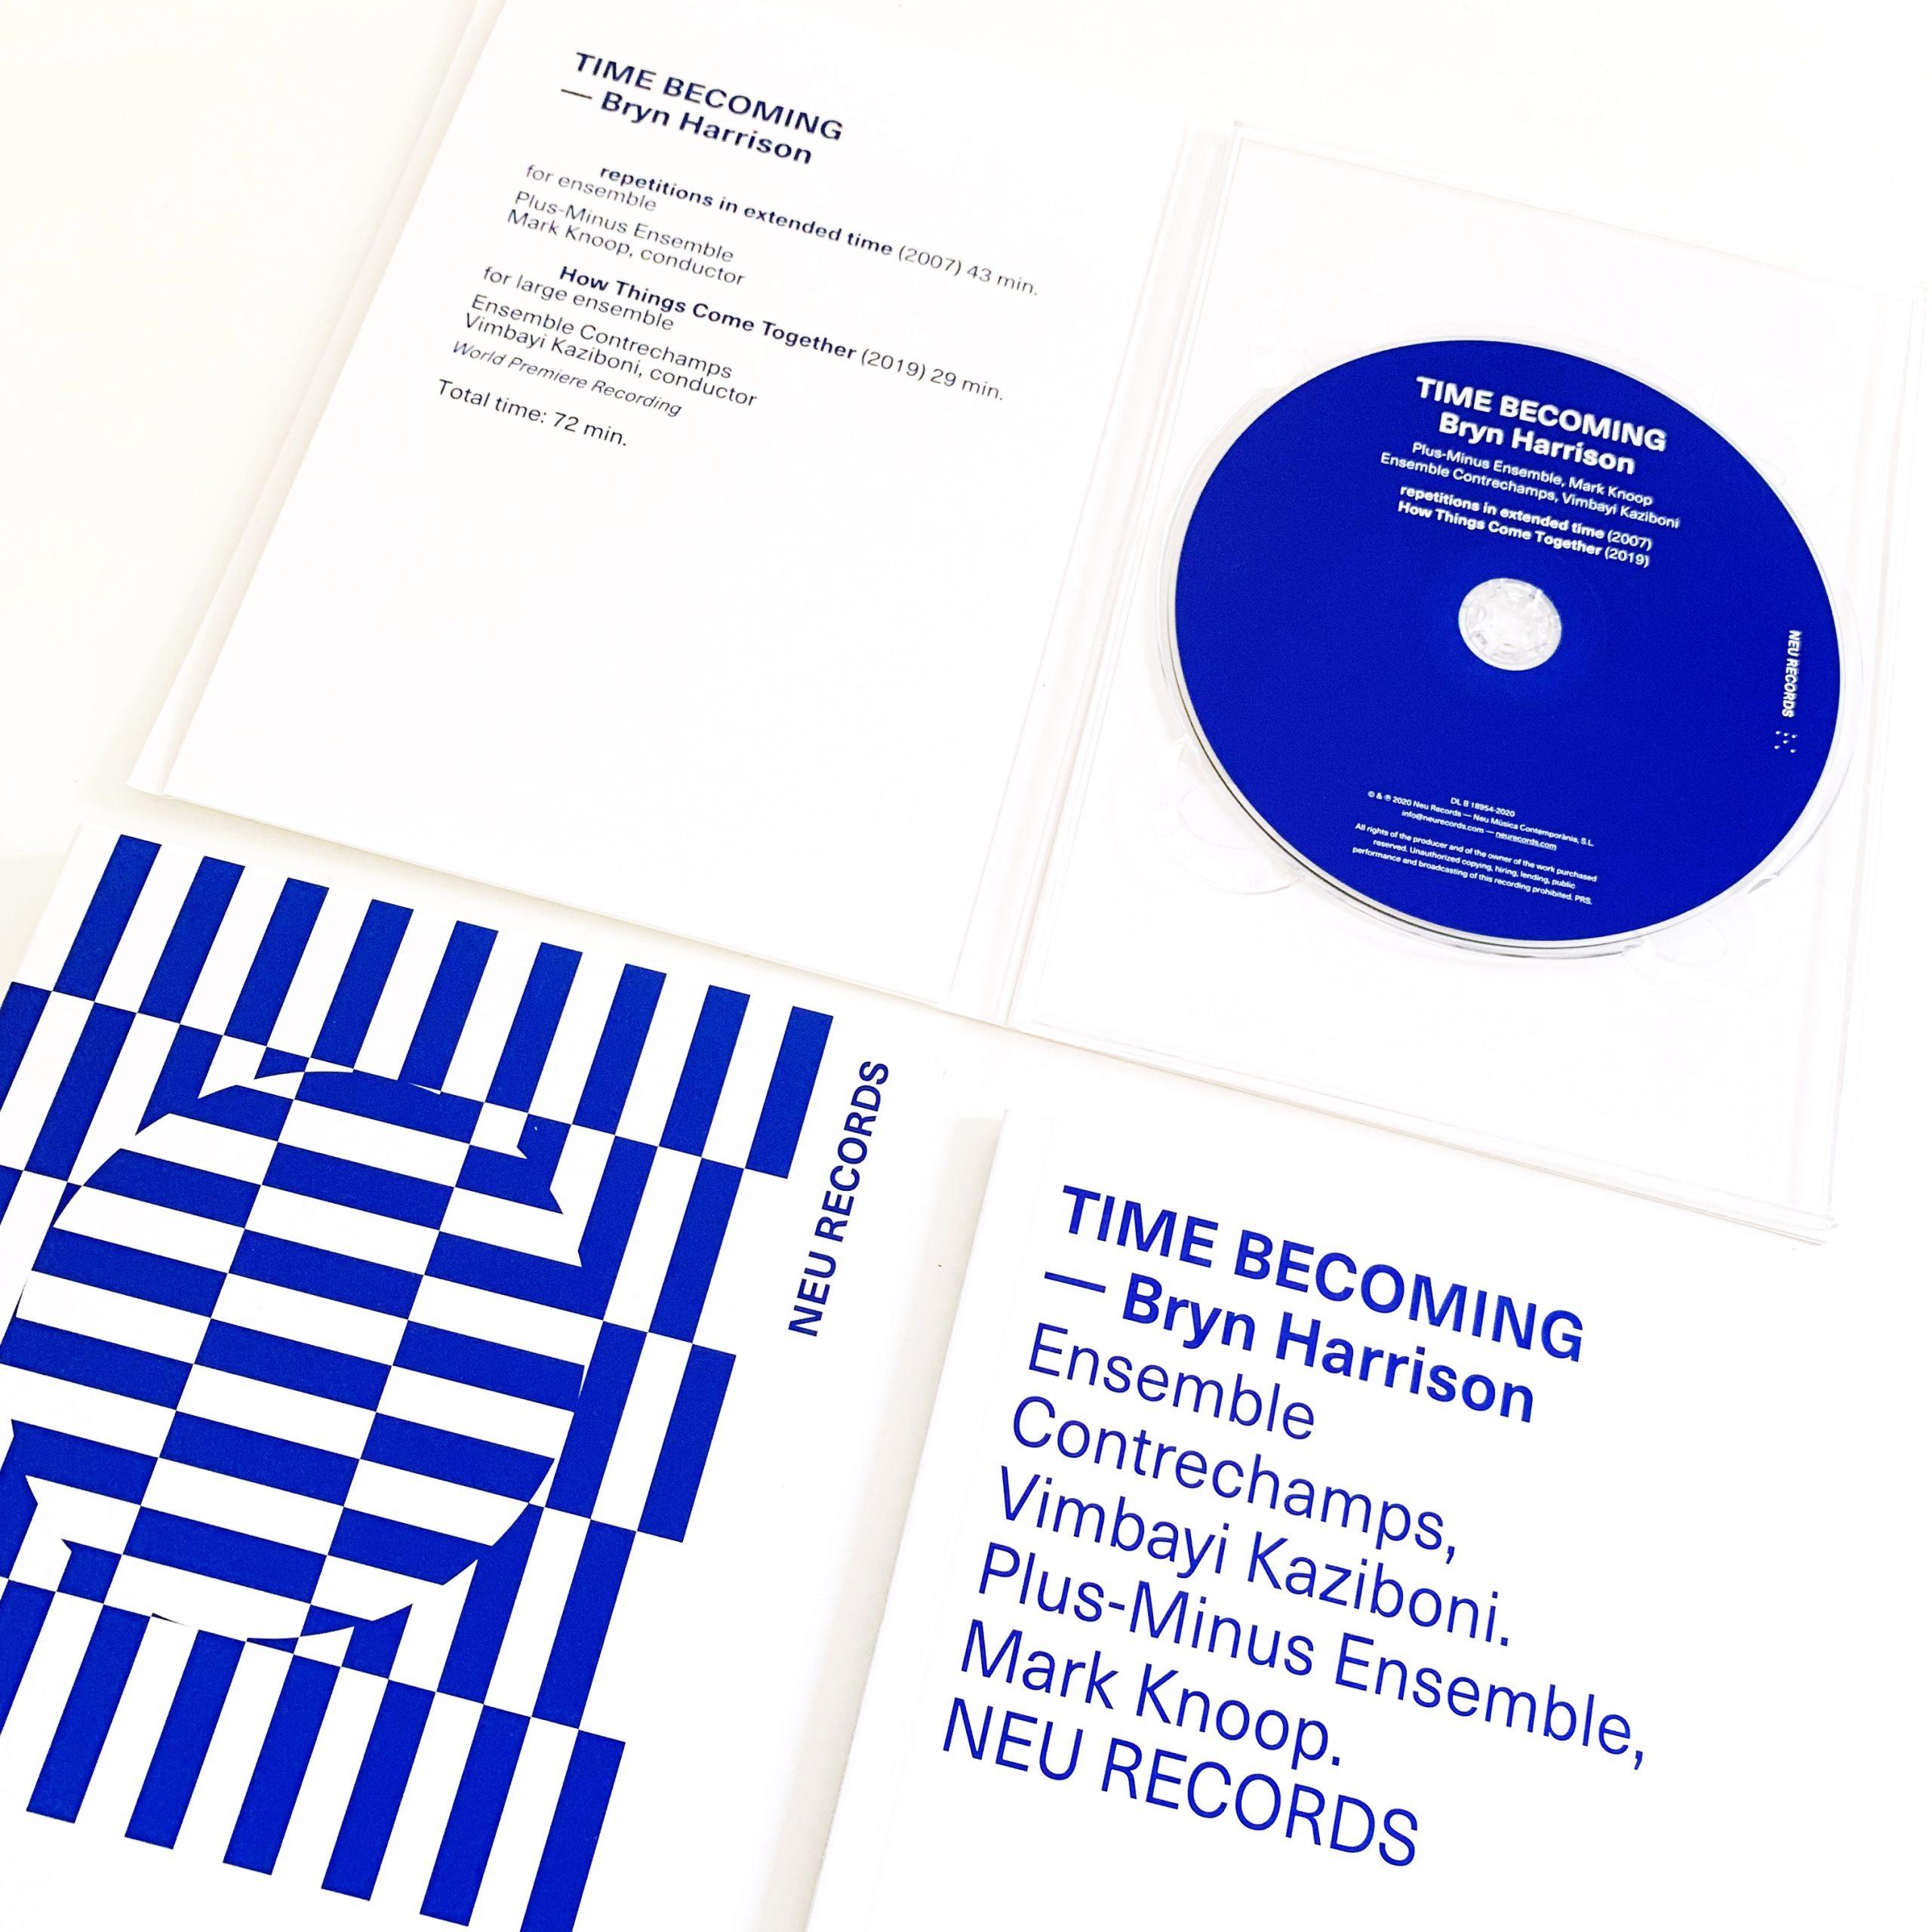 Bryn Harrison - Time Becoming - CD inside